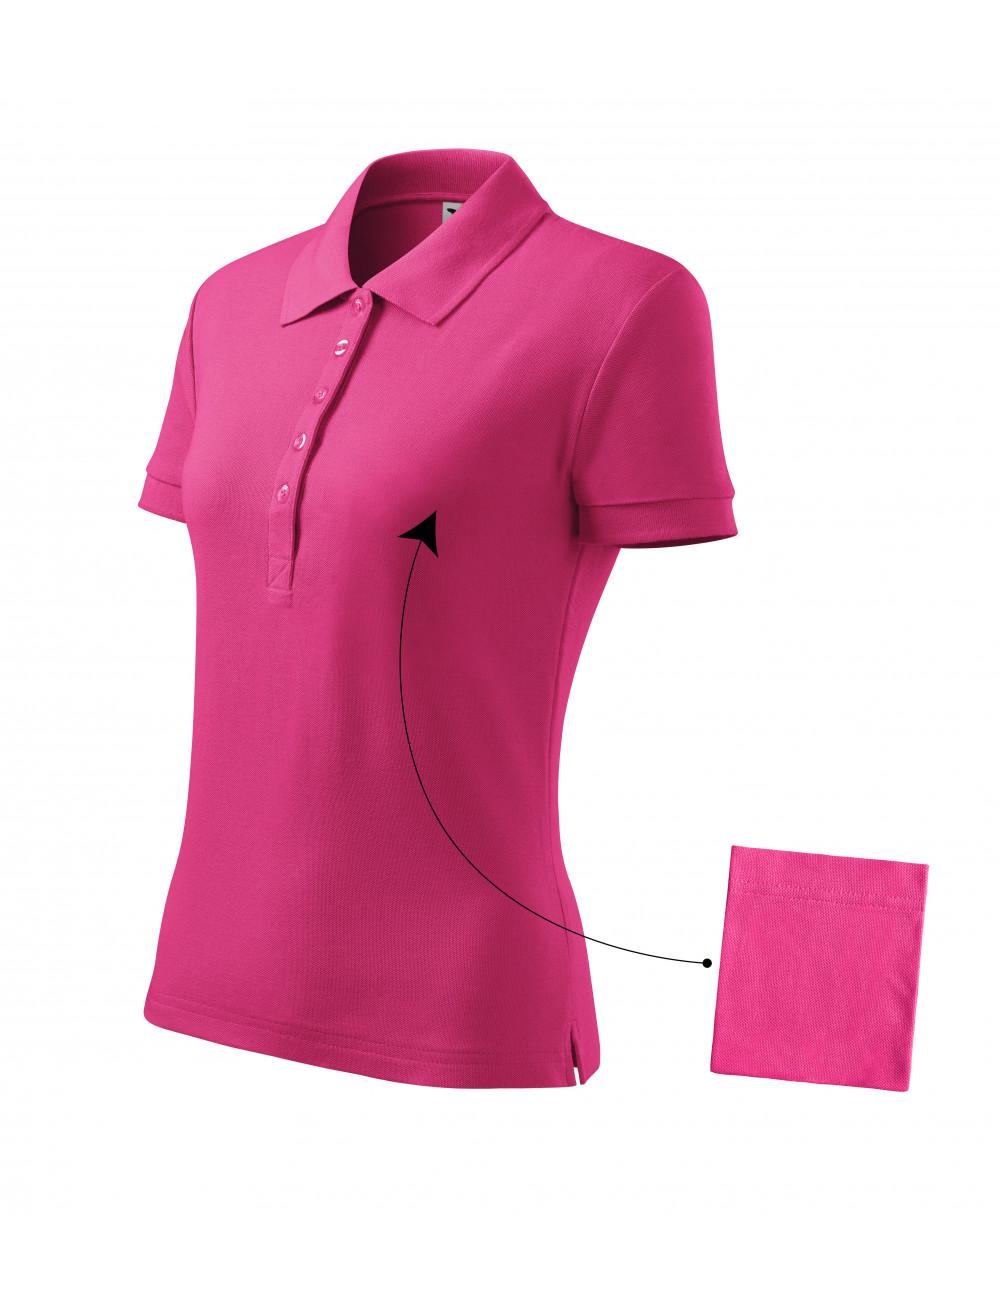 Adler MALFINI Koszulka polo damska Cotton 213 czerwień purpurowa